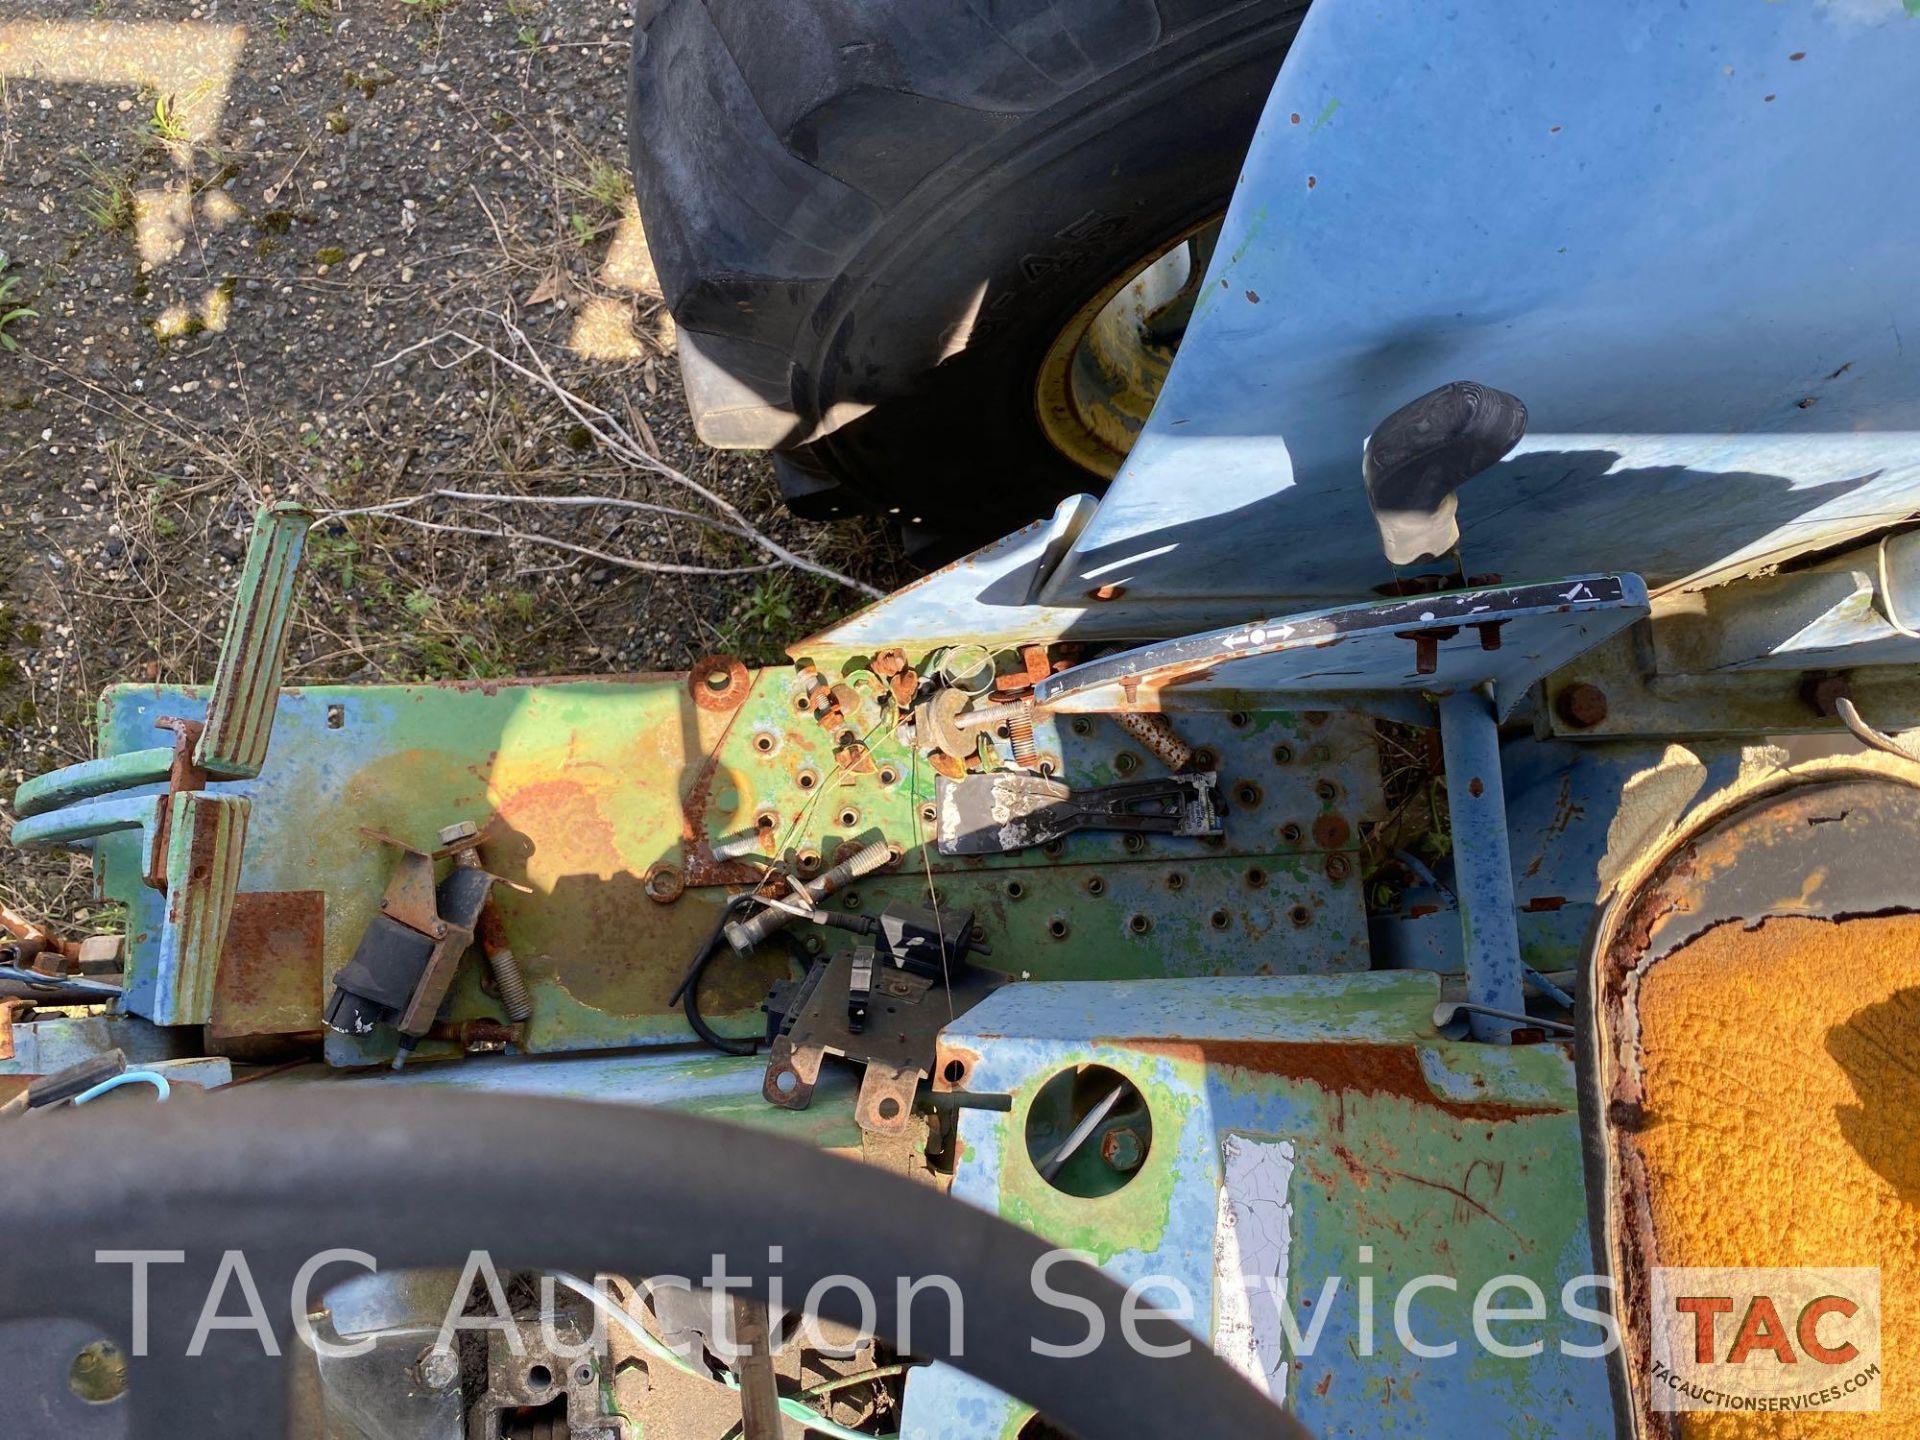 John Deere 2150 Farm Tractor - Image 17 of 34